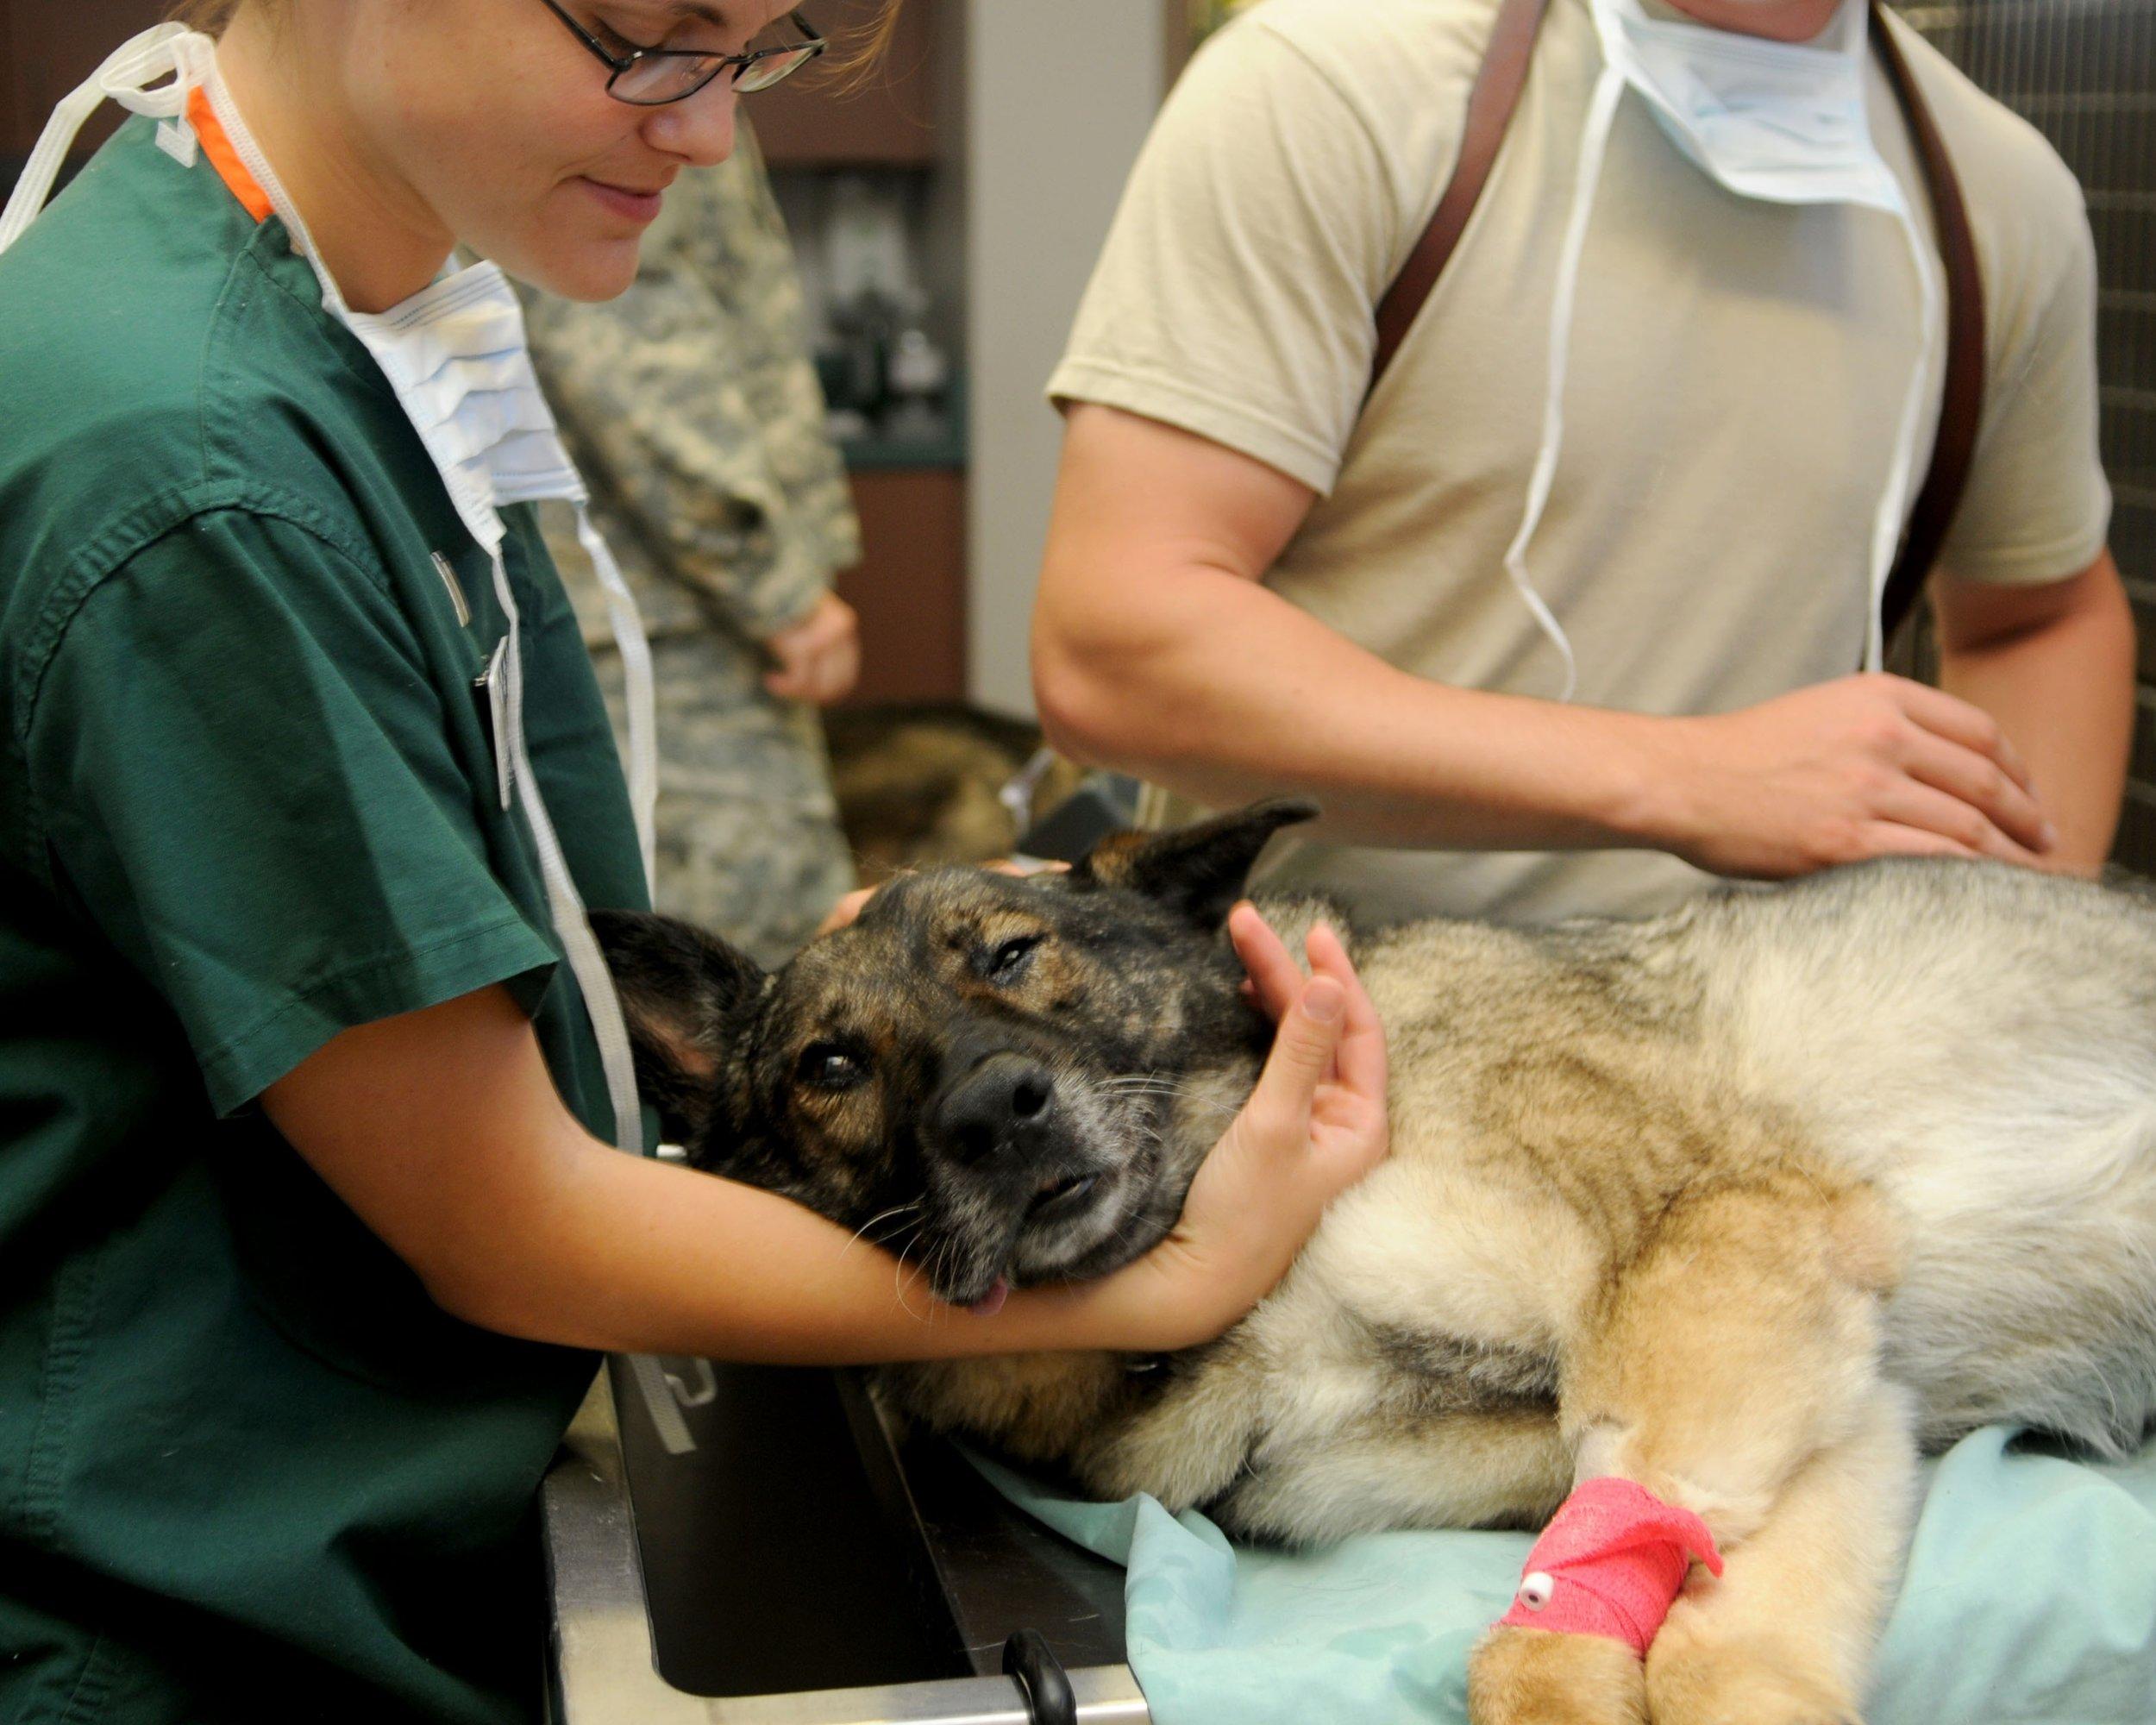 puppy-dog-animal-canine-care-medicine-1137660-pxhere.com.jpg